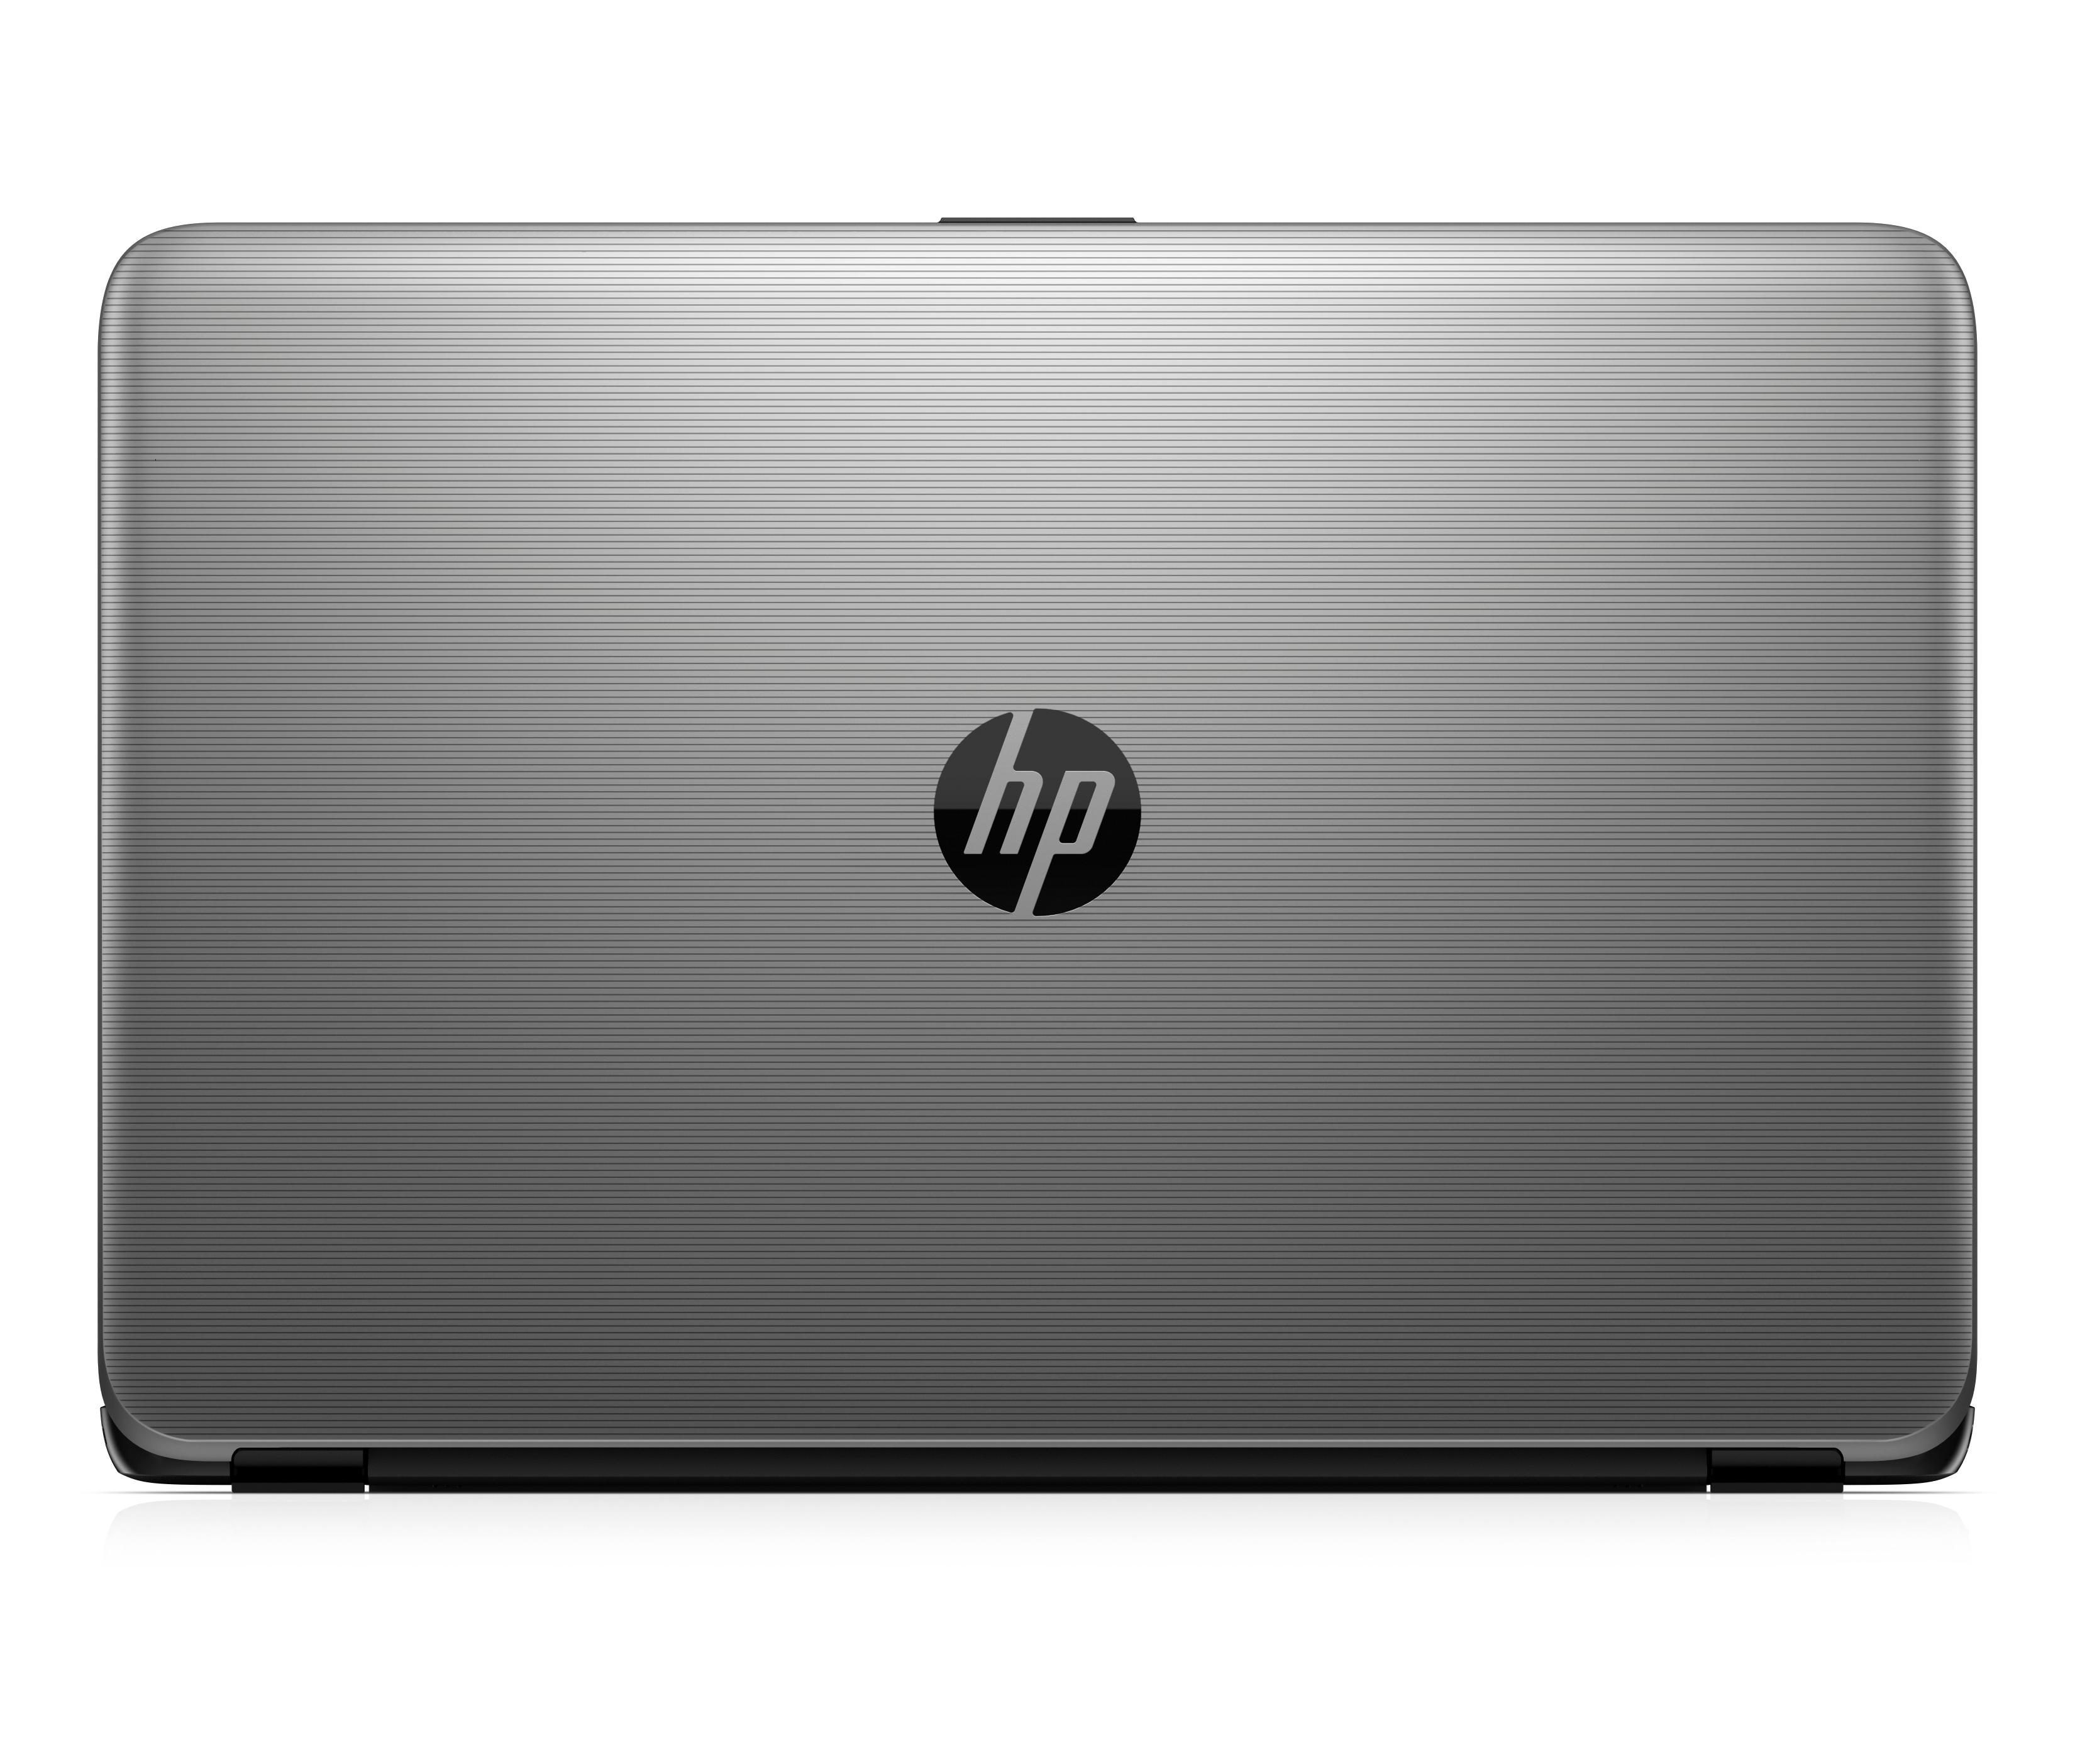 hp 15 ay110na laptop 15 6 inch intel core i5 7200u 8 gb ram 1 tb hdd windows 10 turbo. Black Bedroom Furniture Sets. Home Design Ideas